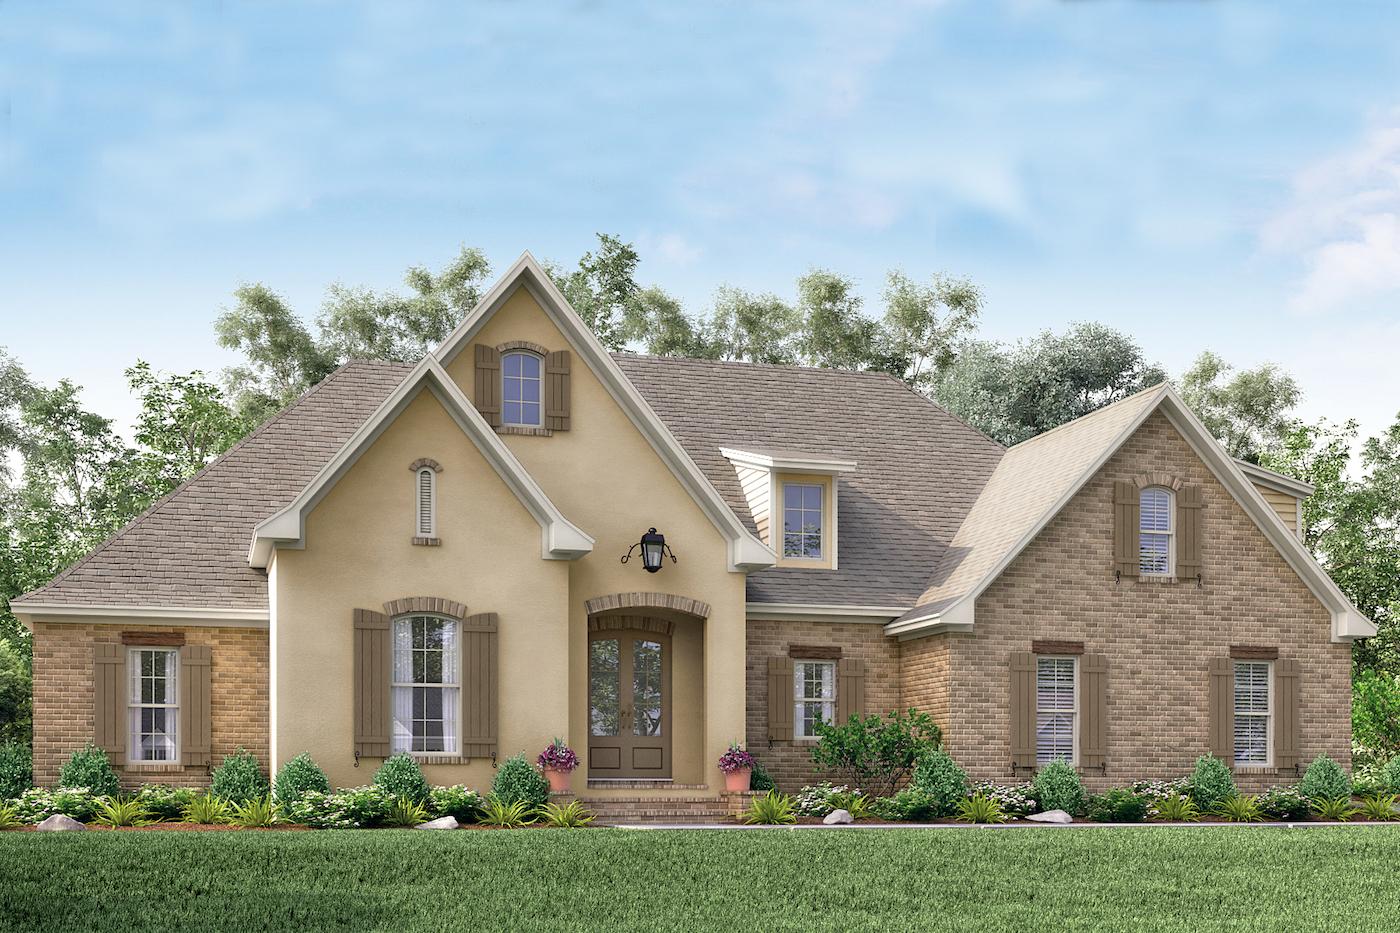 Acadian House Plan 1421154 4 Bedrm 2210 Sq Ft Home Plan